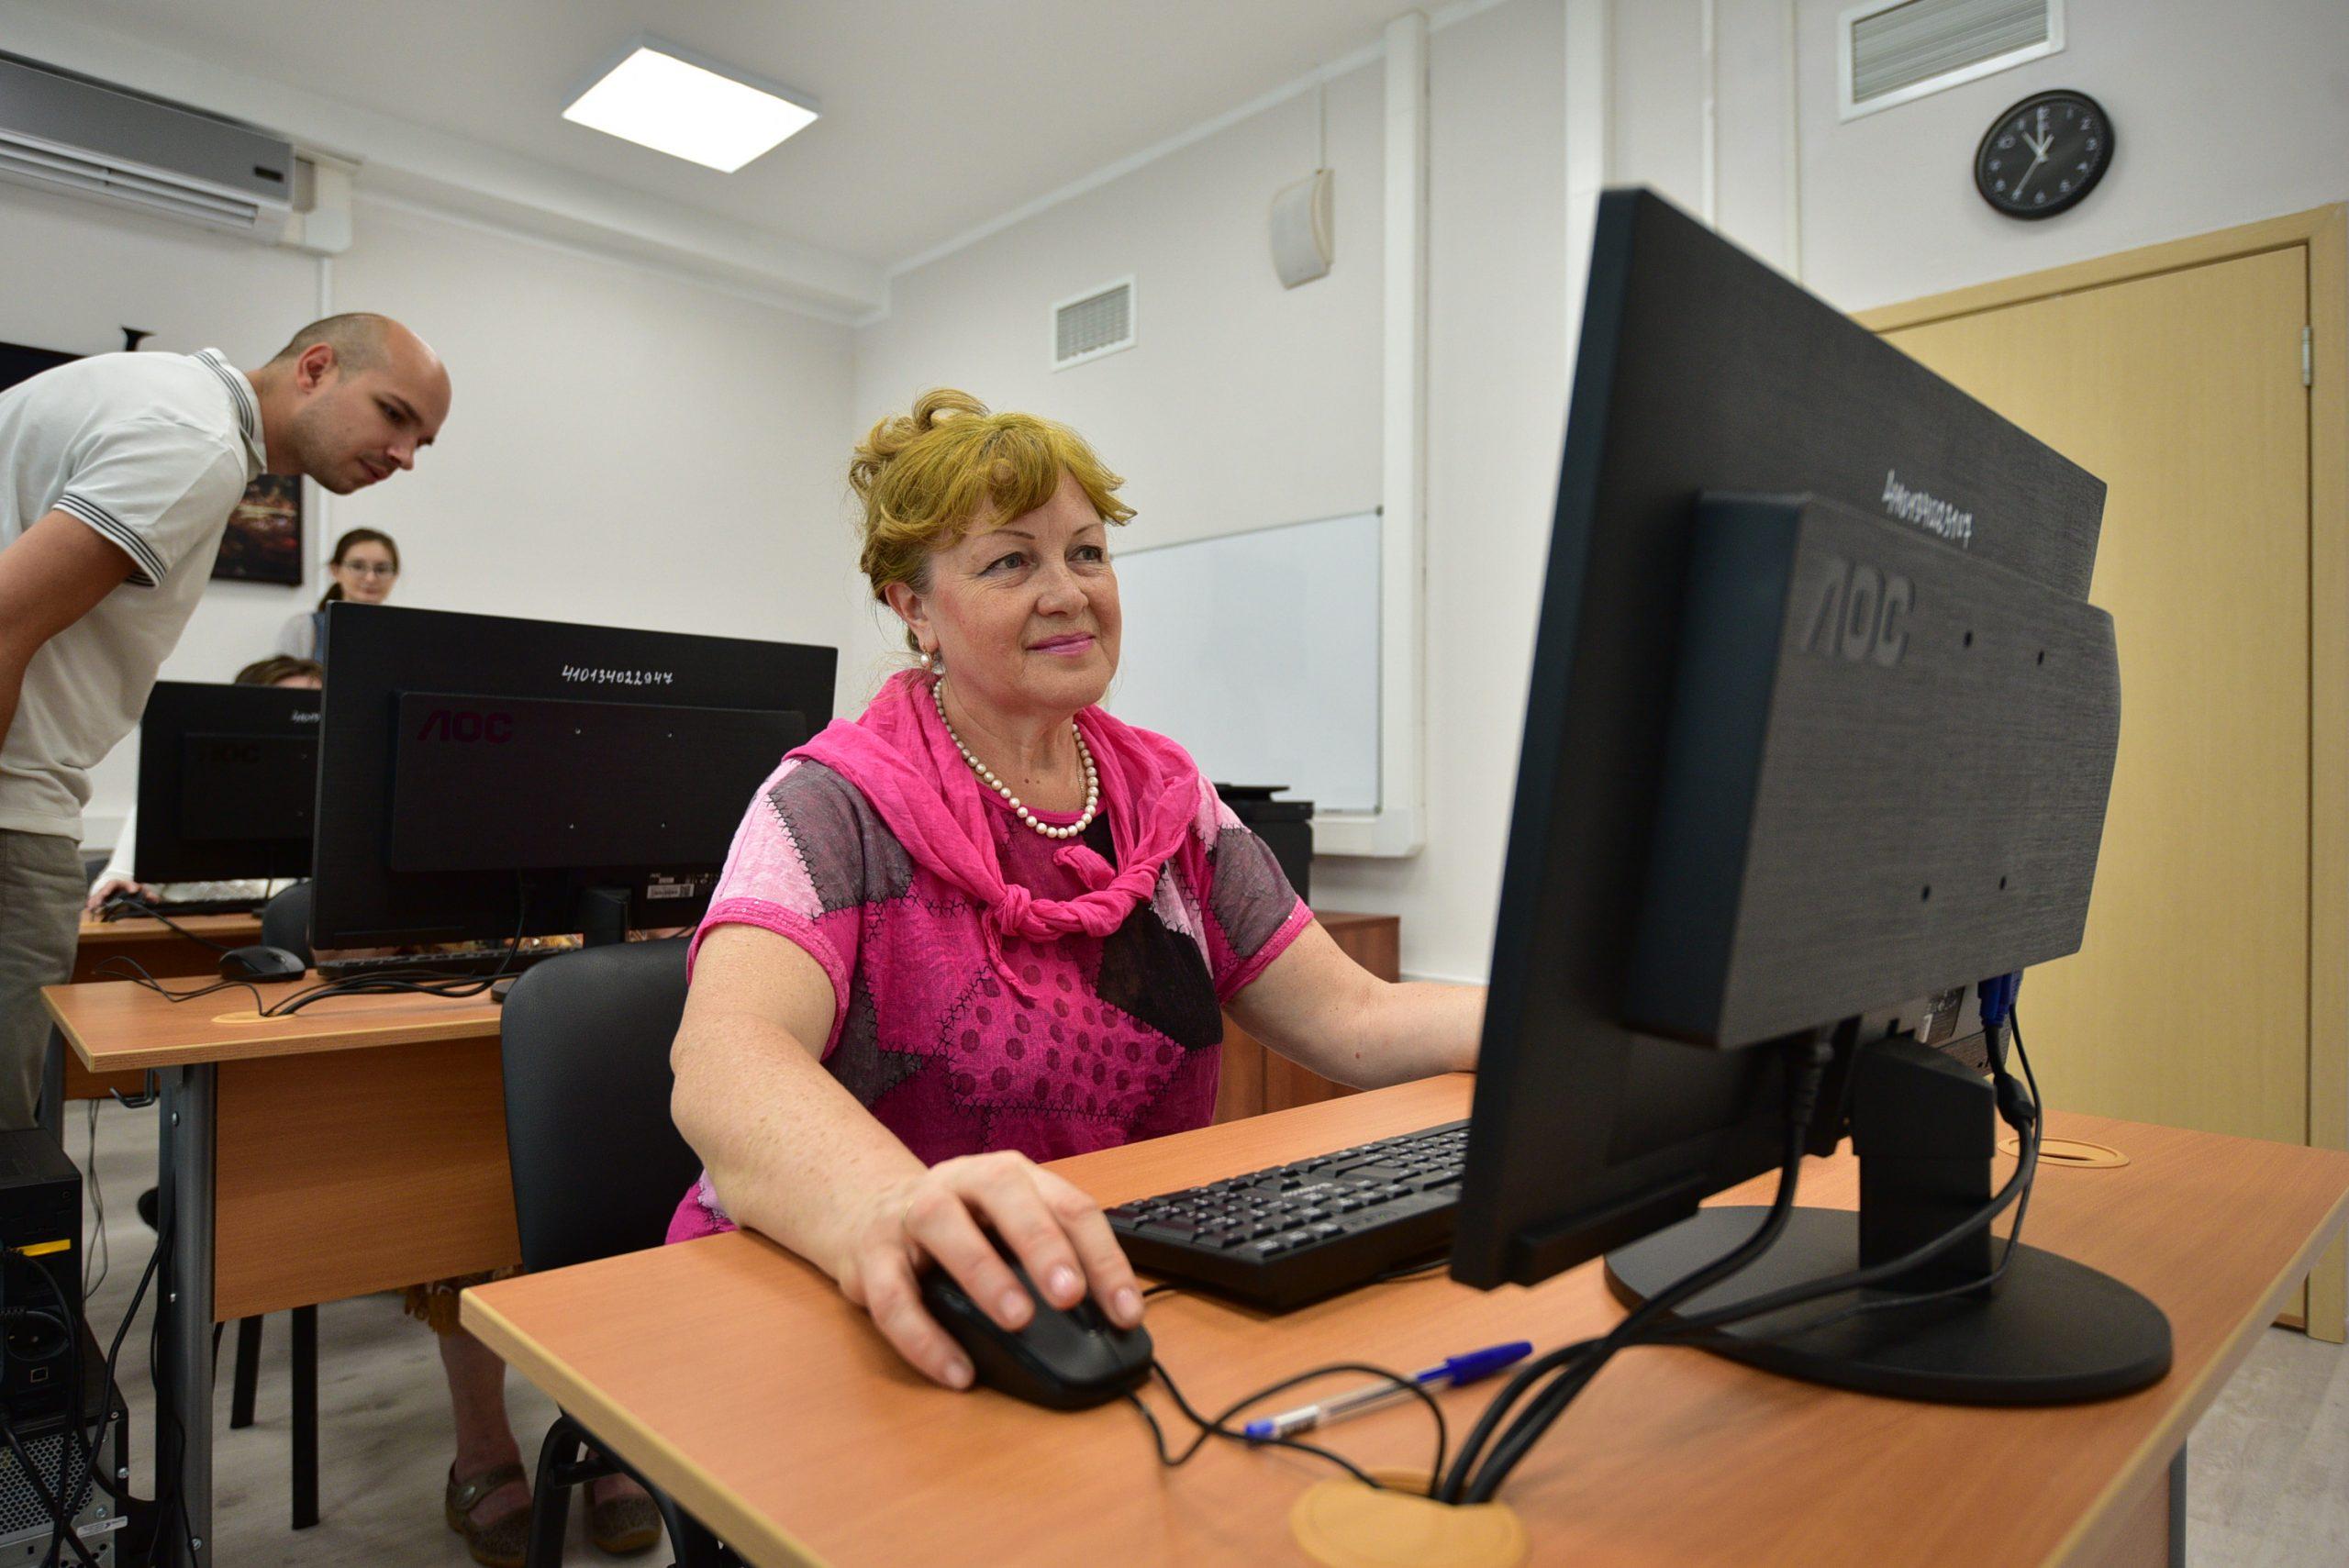 Специалисты Центра соцобслуживания «Орехово» проведут онлайн-марафон красоты. Фото: Пелагия Замятина, «Вечерняя Москва»